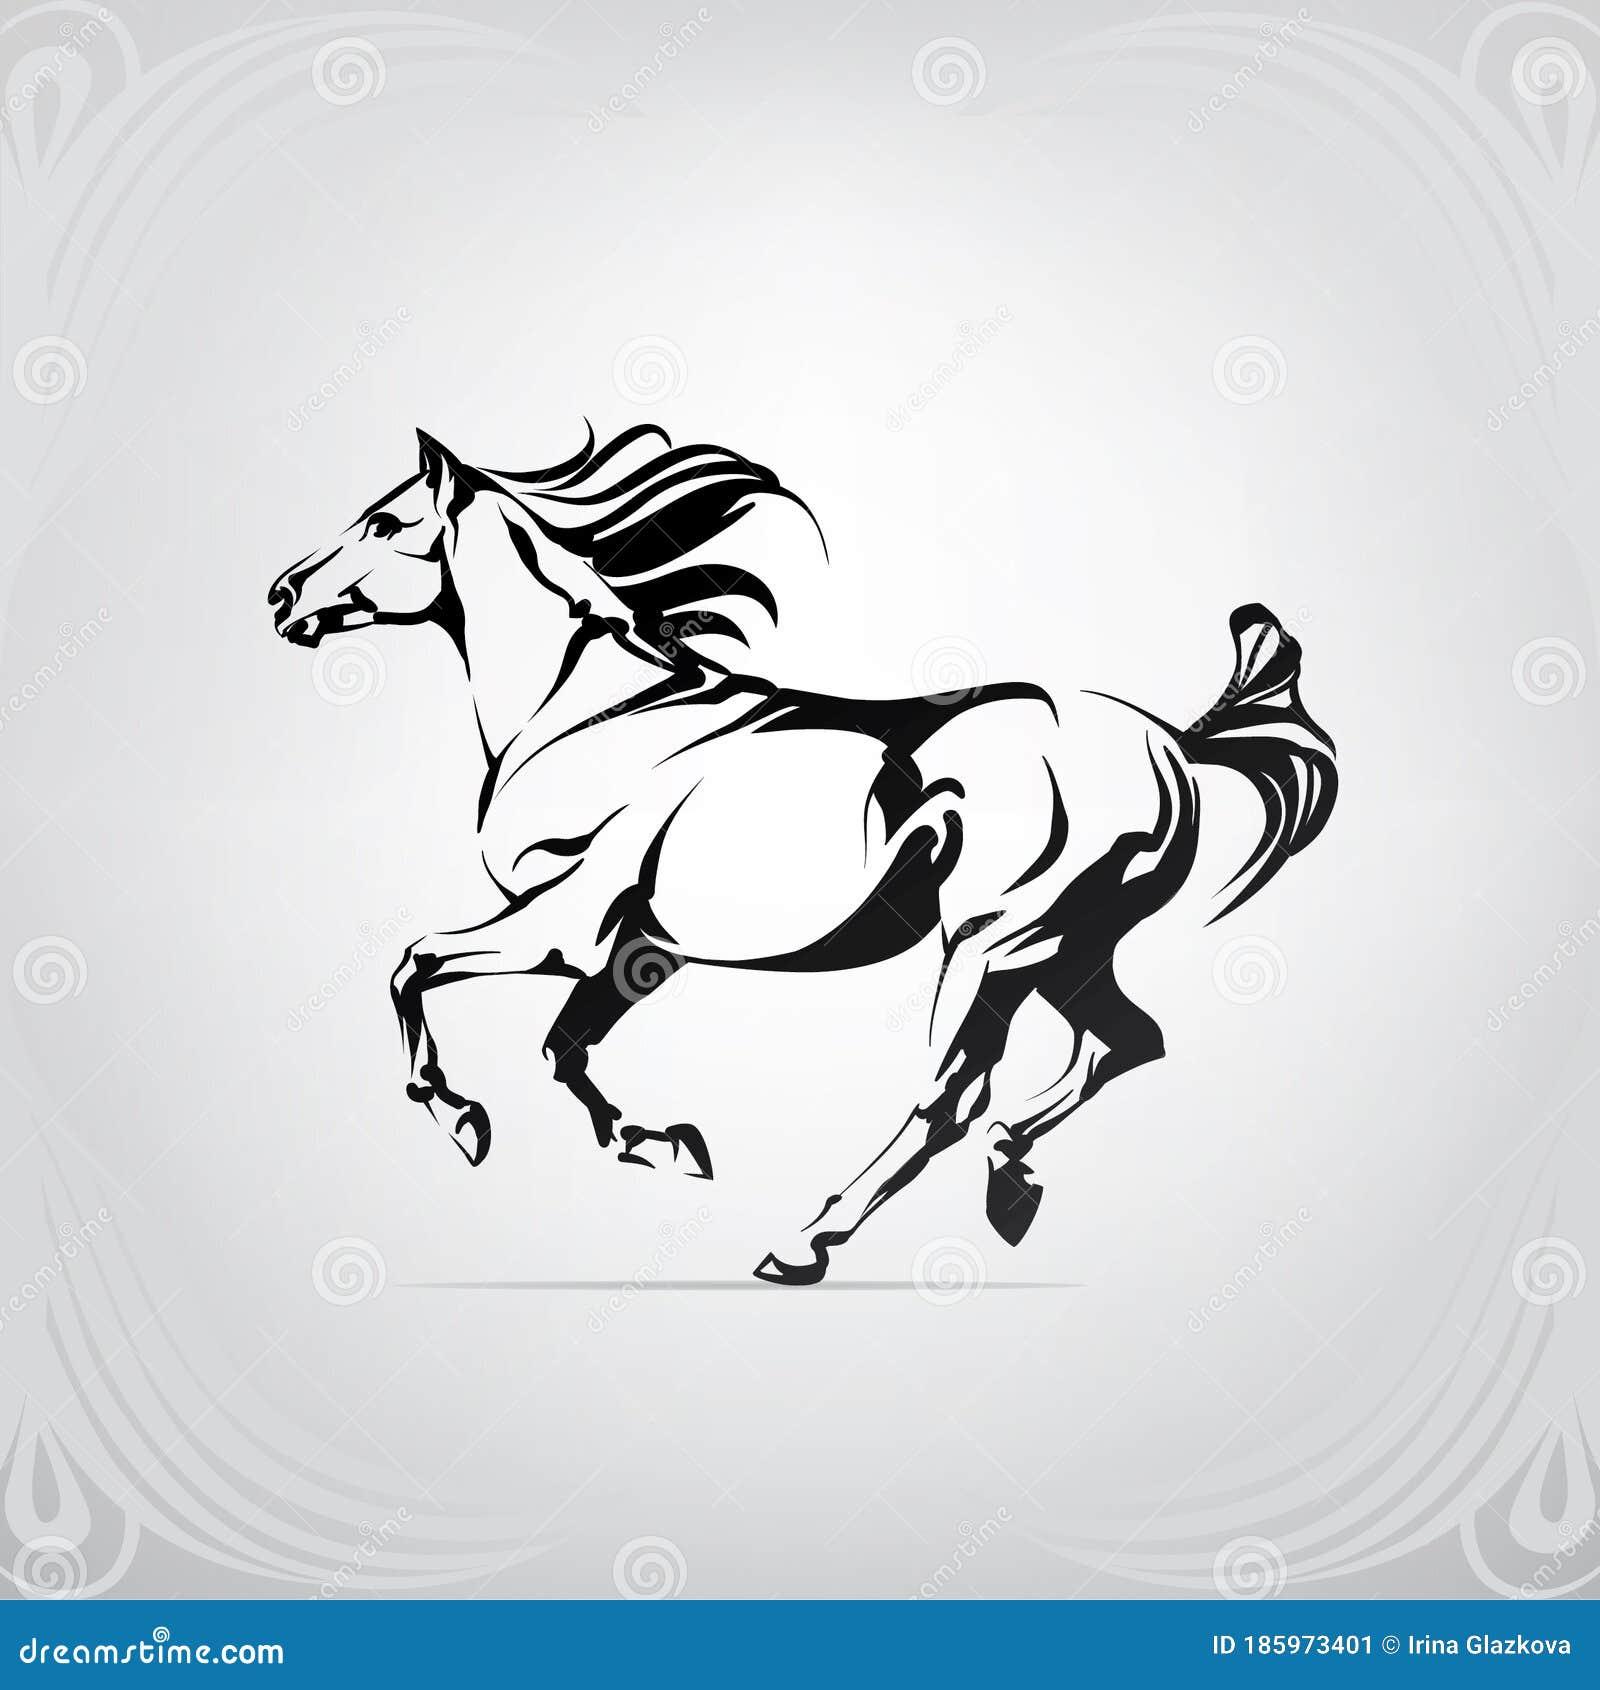 Vector Silhouette Of A Running Horse Vector Illustration Stock Vector Illustration Of Black Outline 185973401